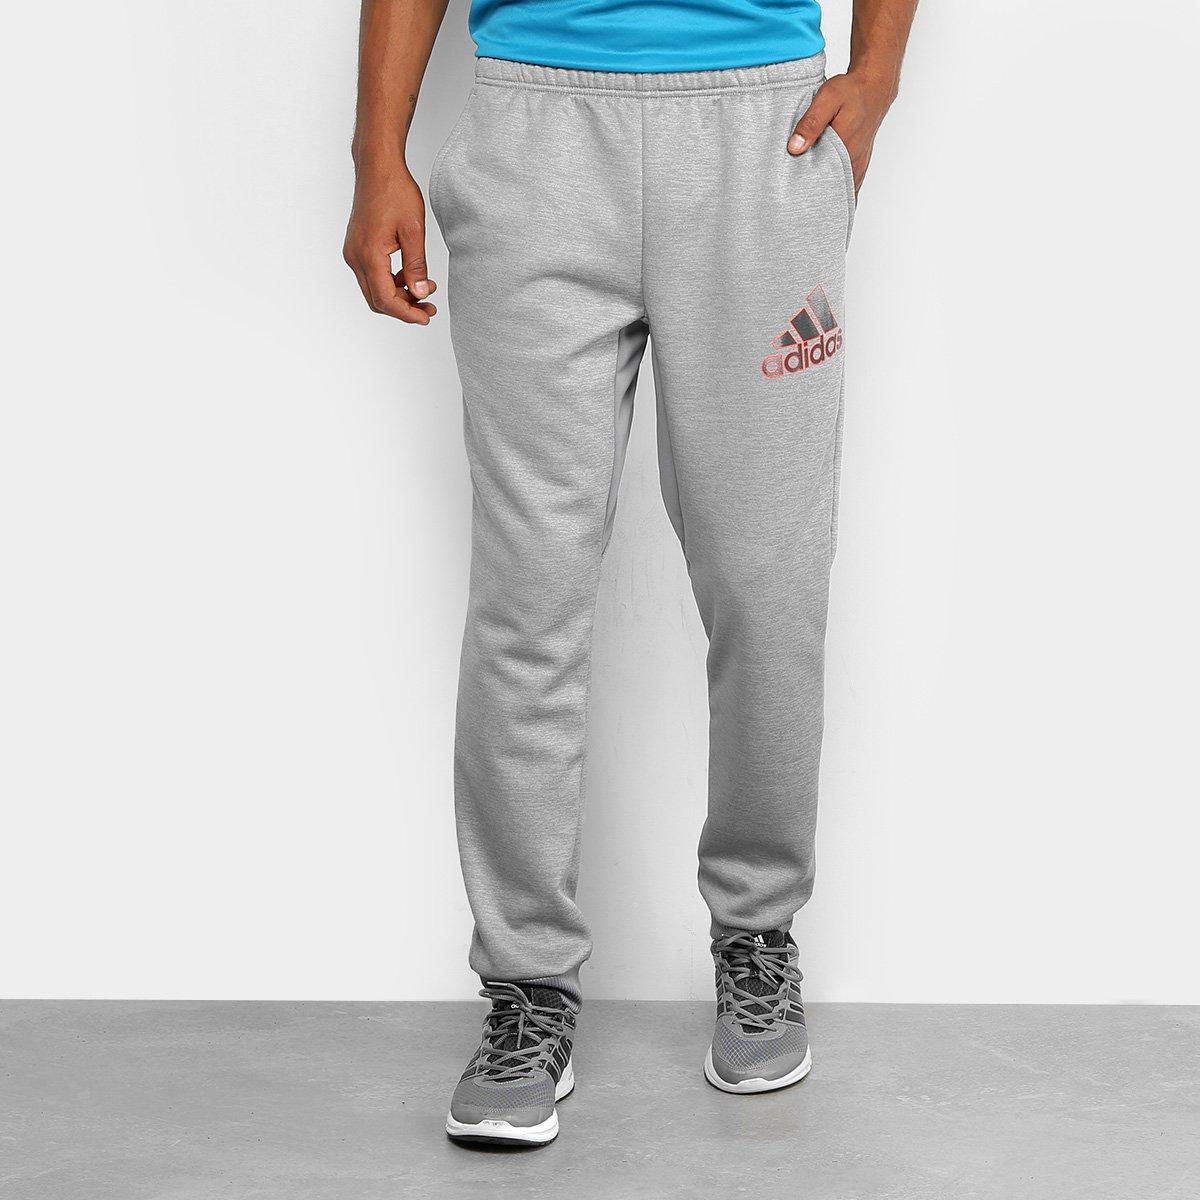 4d8eb915d Calça Adidas Generalista Masculina